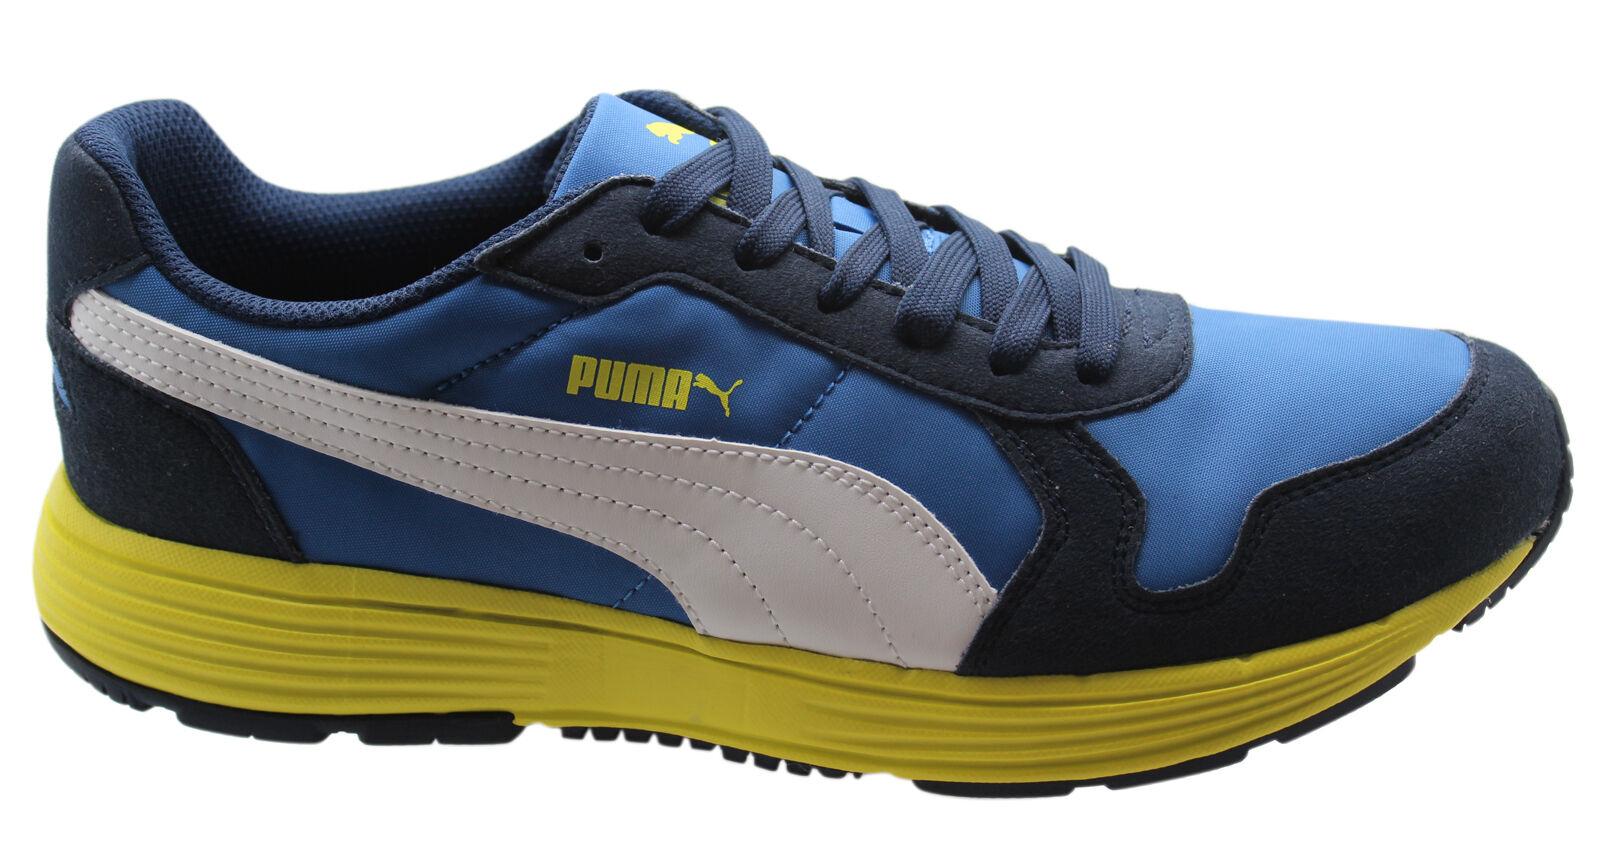 Puma Future Lace Street Runner Hombre Trainers Nylon Running Azul Lace Future 356740 10 D34 d4b346